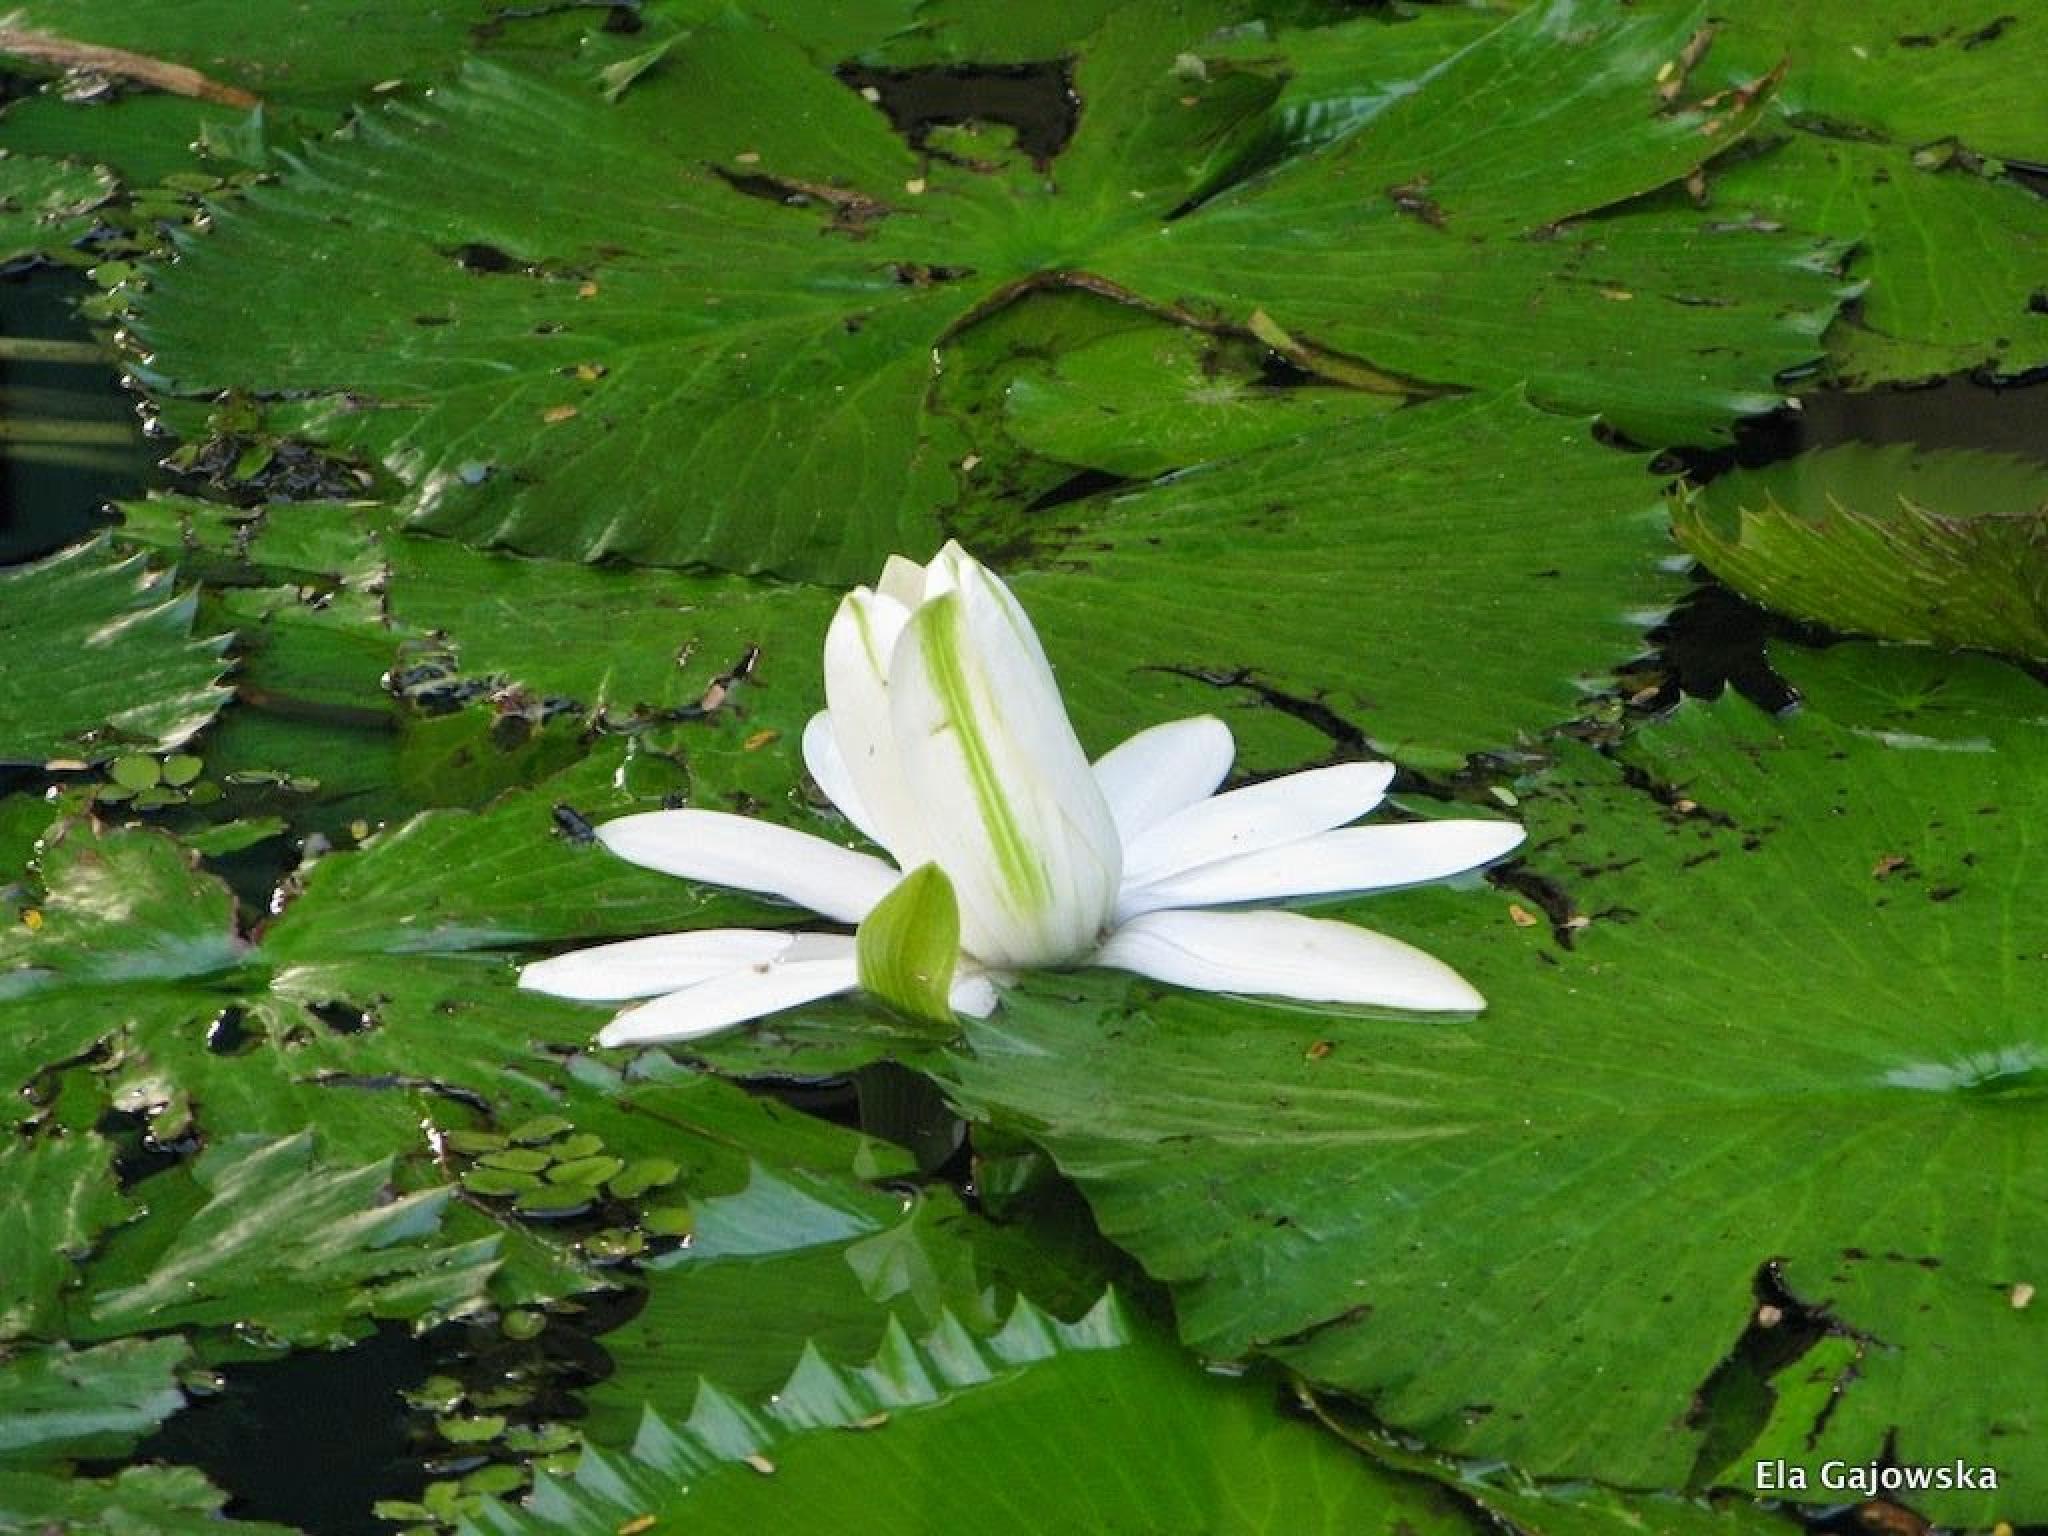 White lotus by Ela Gajowska